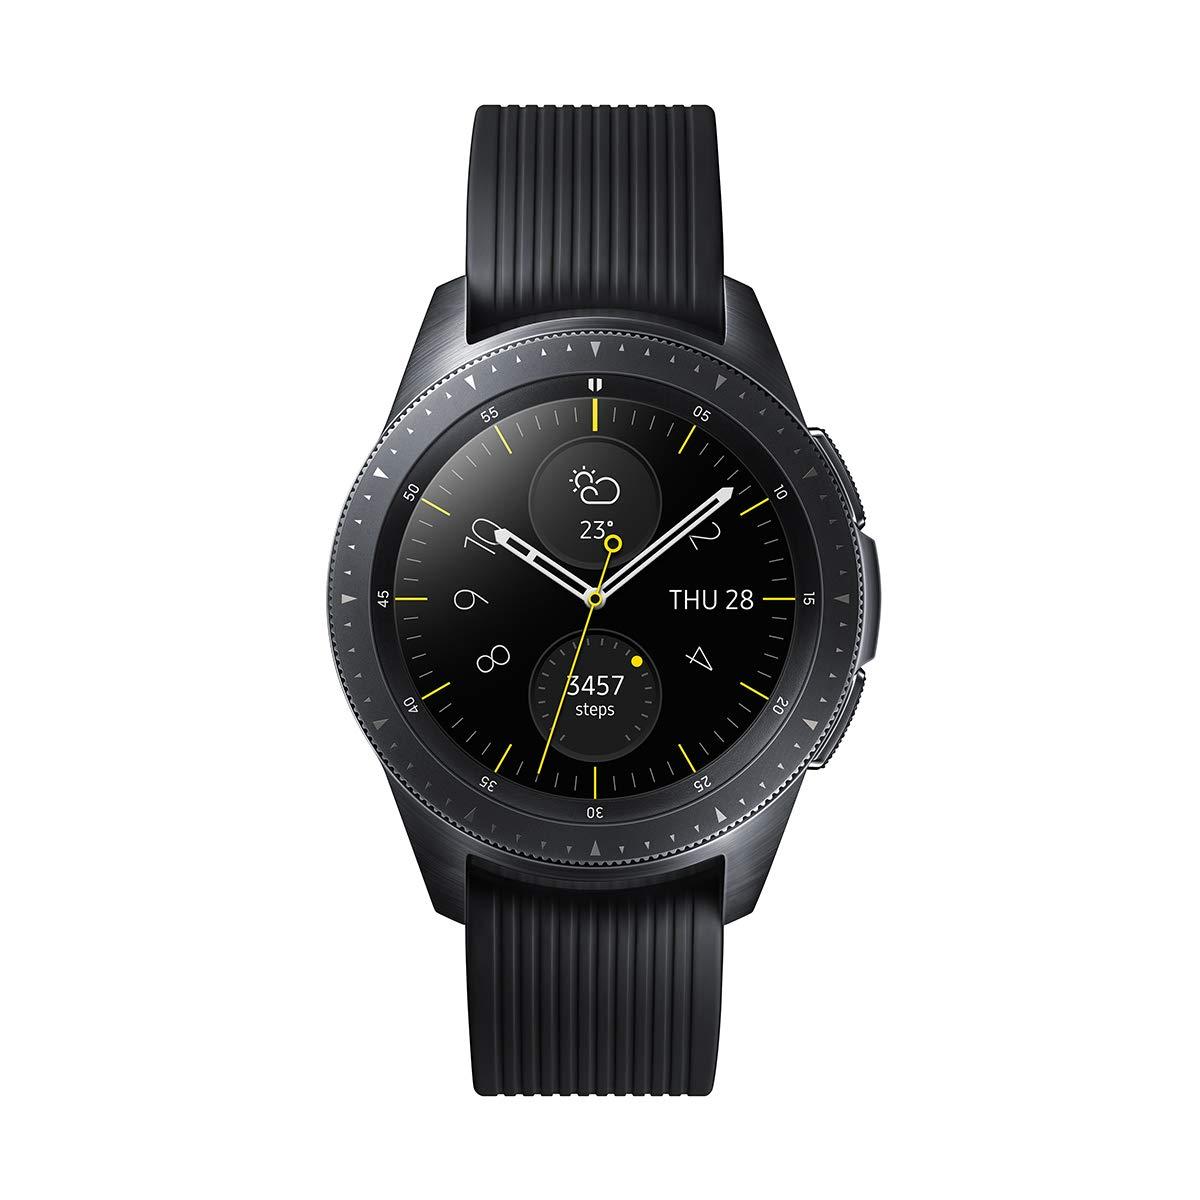 Samsung Galaxy Watch - Reloj Inteligente, Bluetooth, Negro, 42 mm- Version española 1